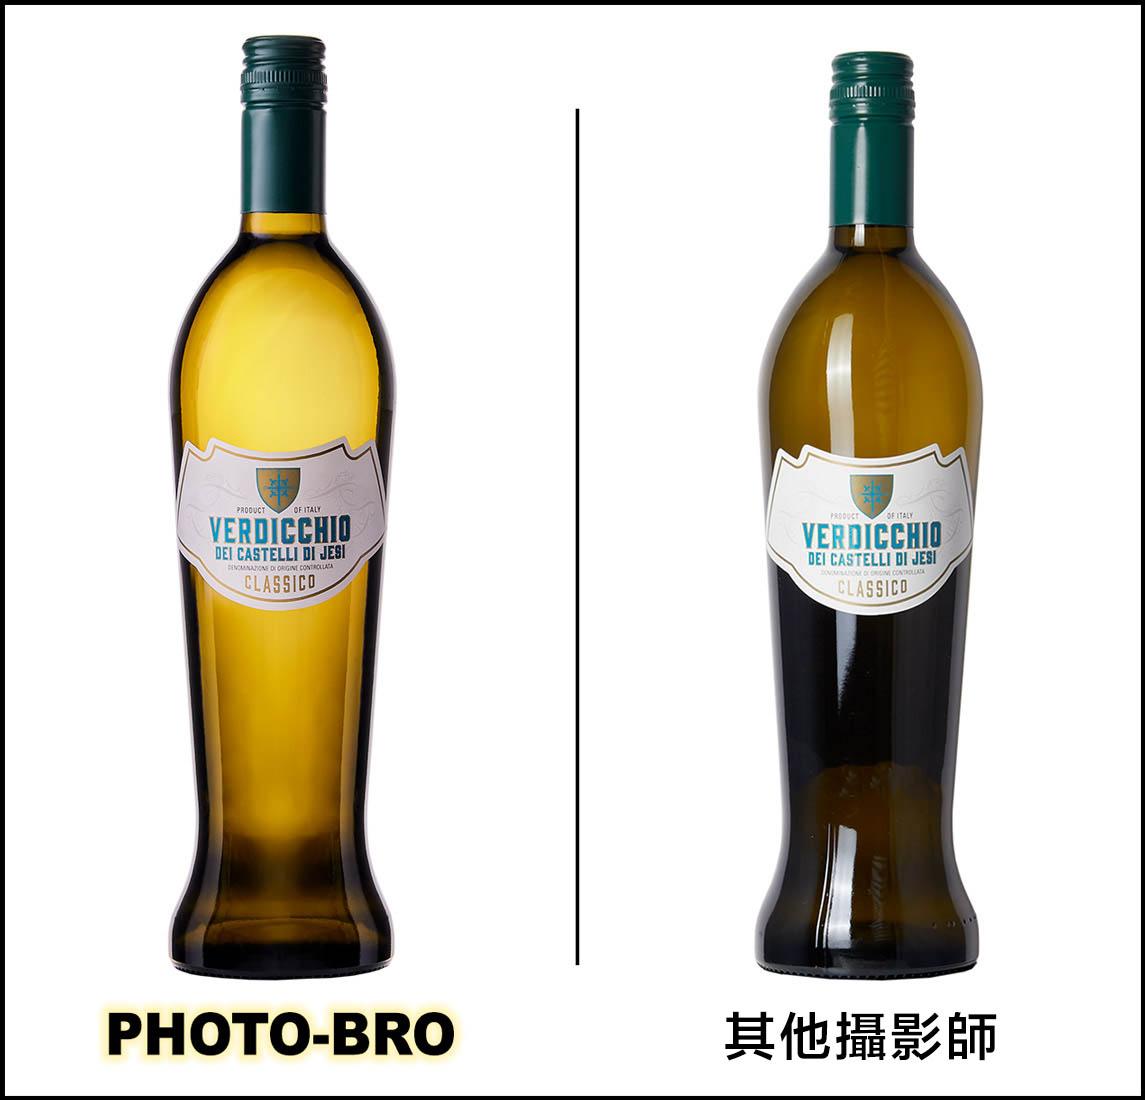 產品攝影 Photo Bro